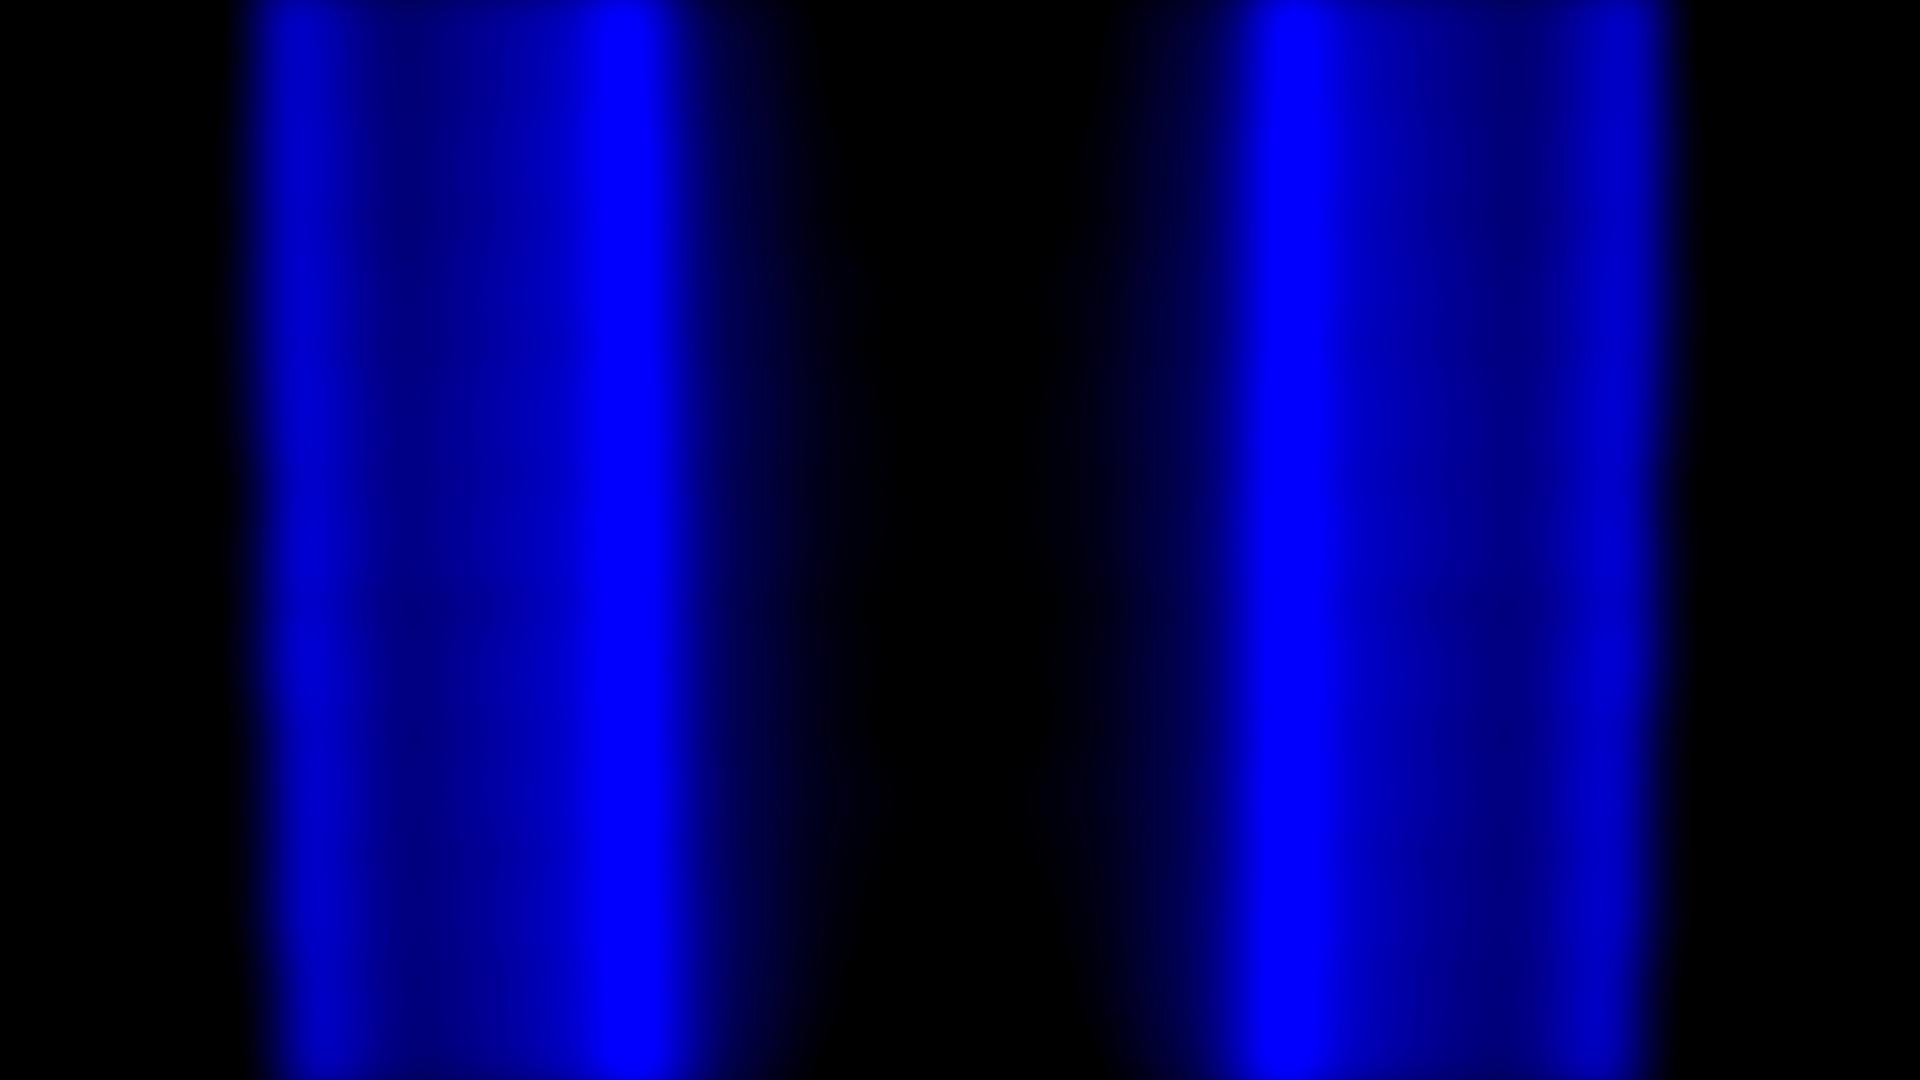 Sorrow- Blue Lines Wide 1